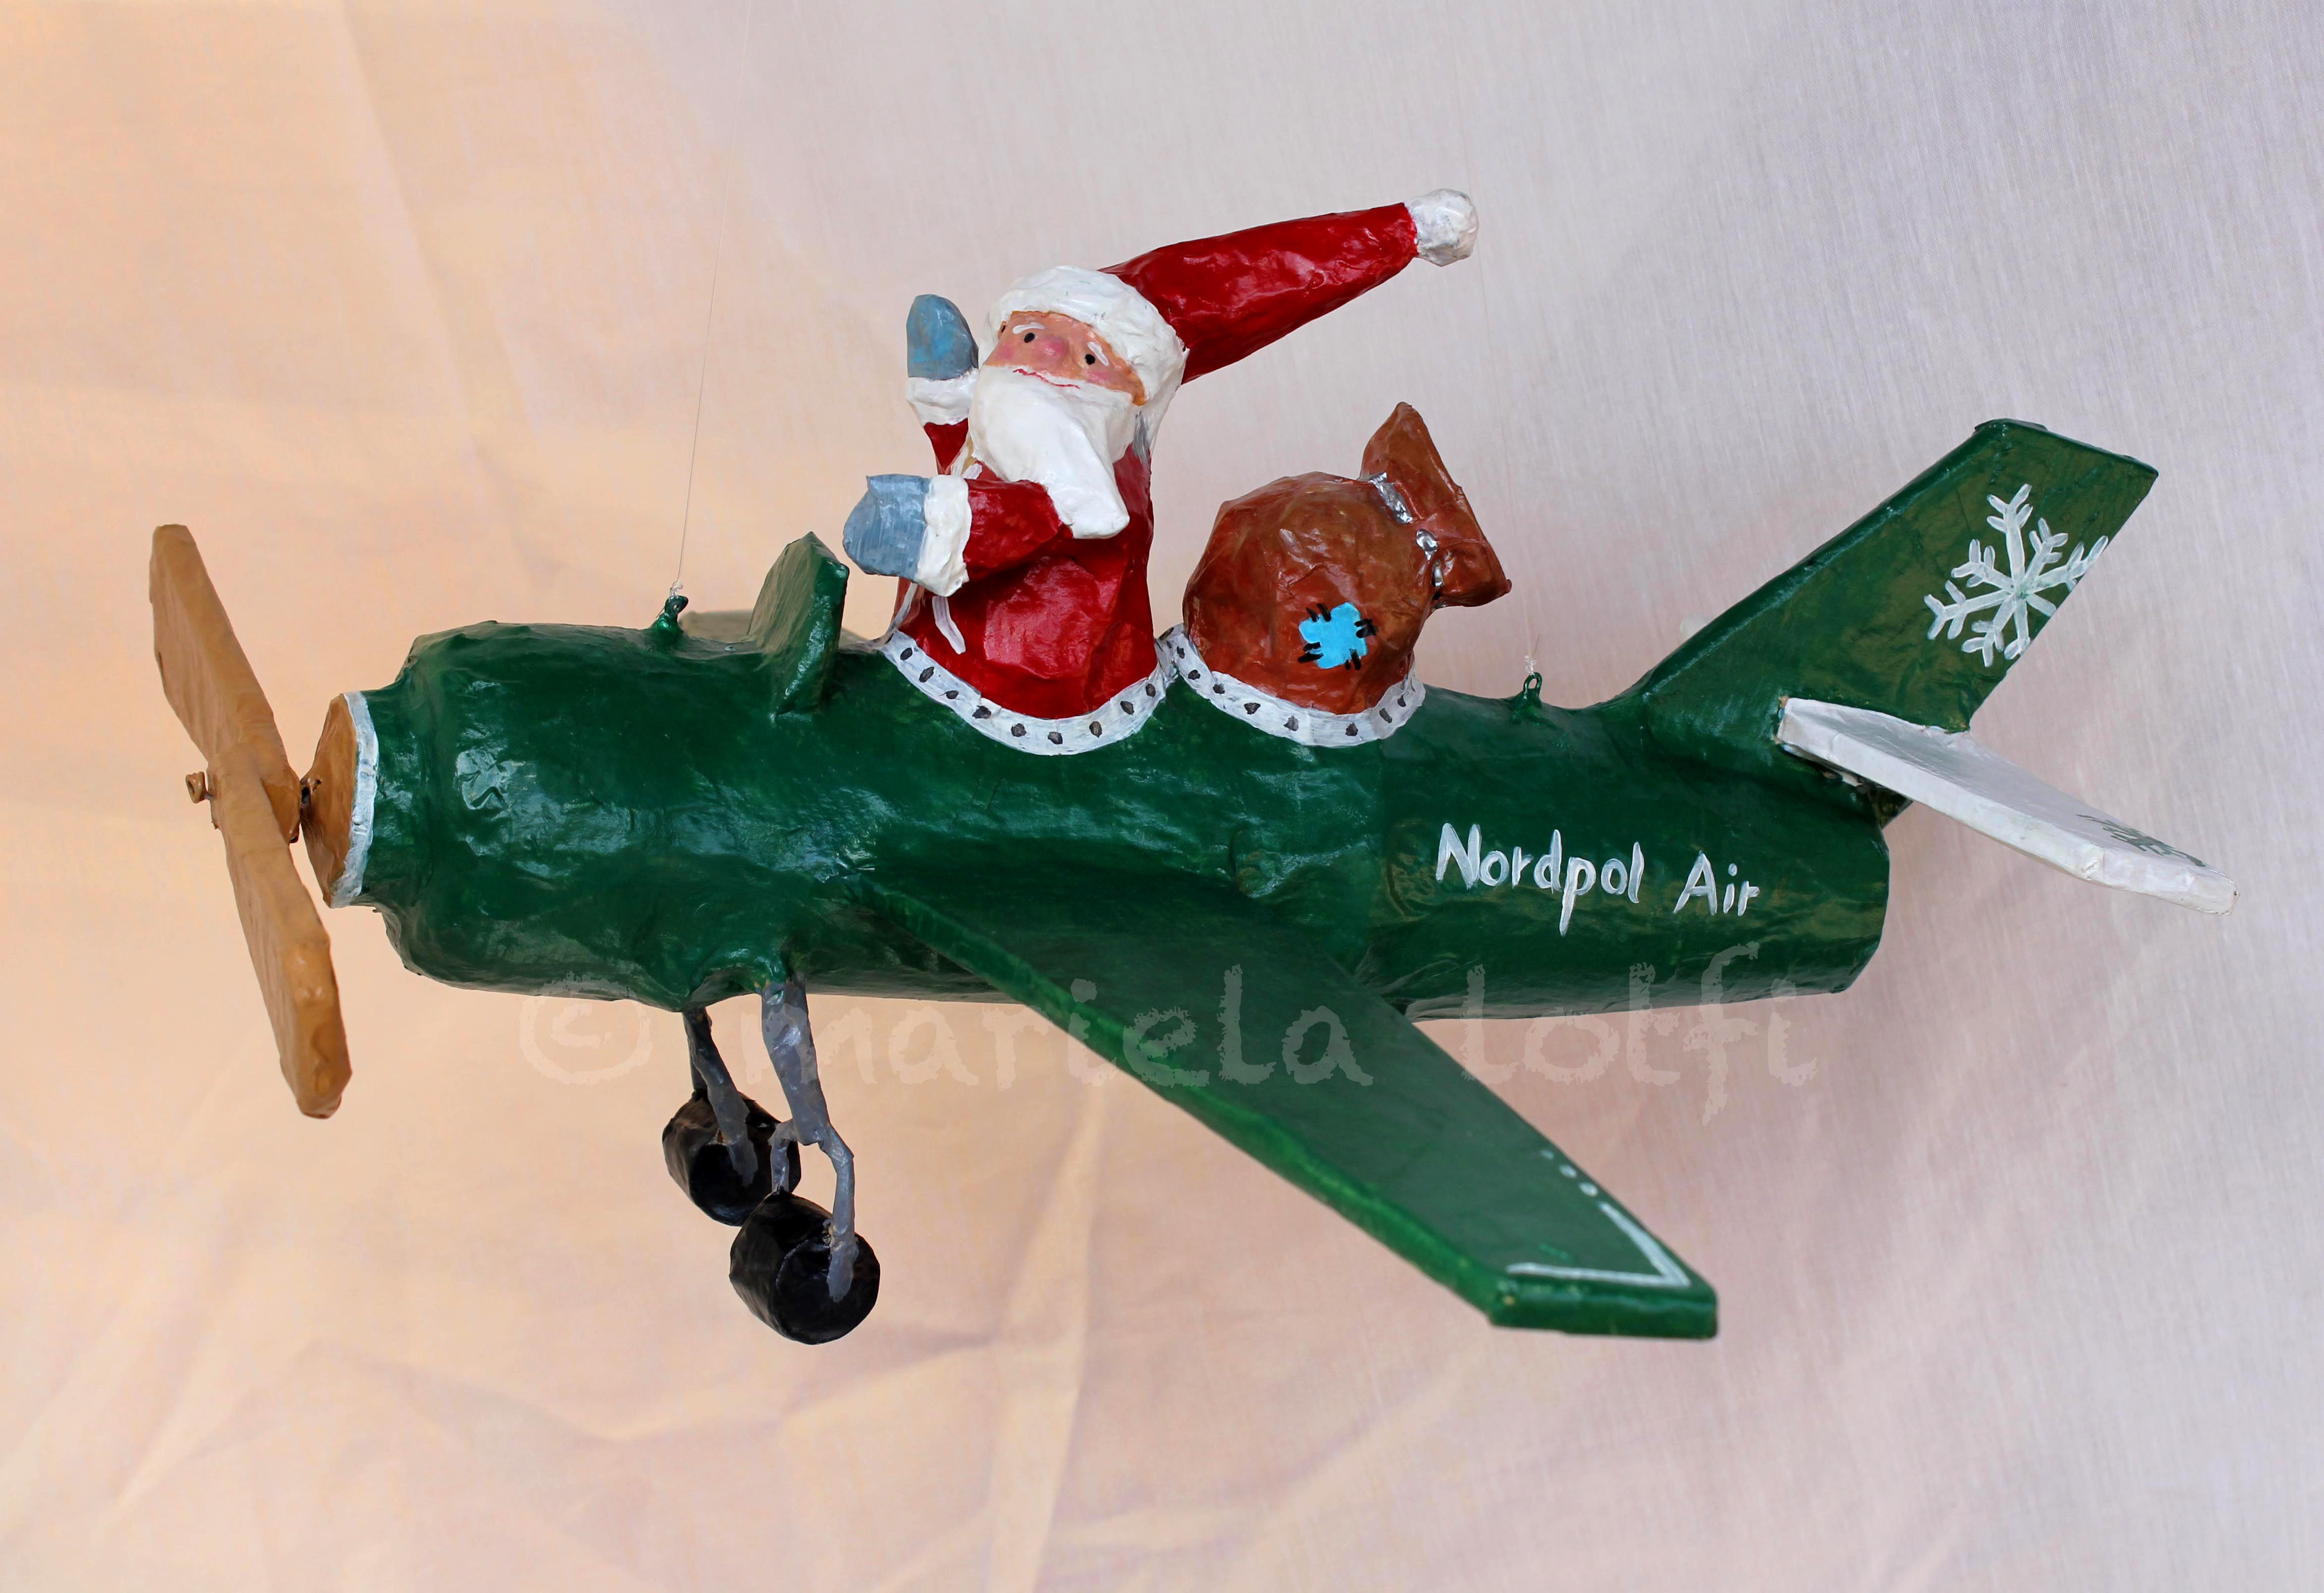 Nordpol Air